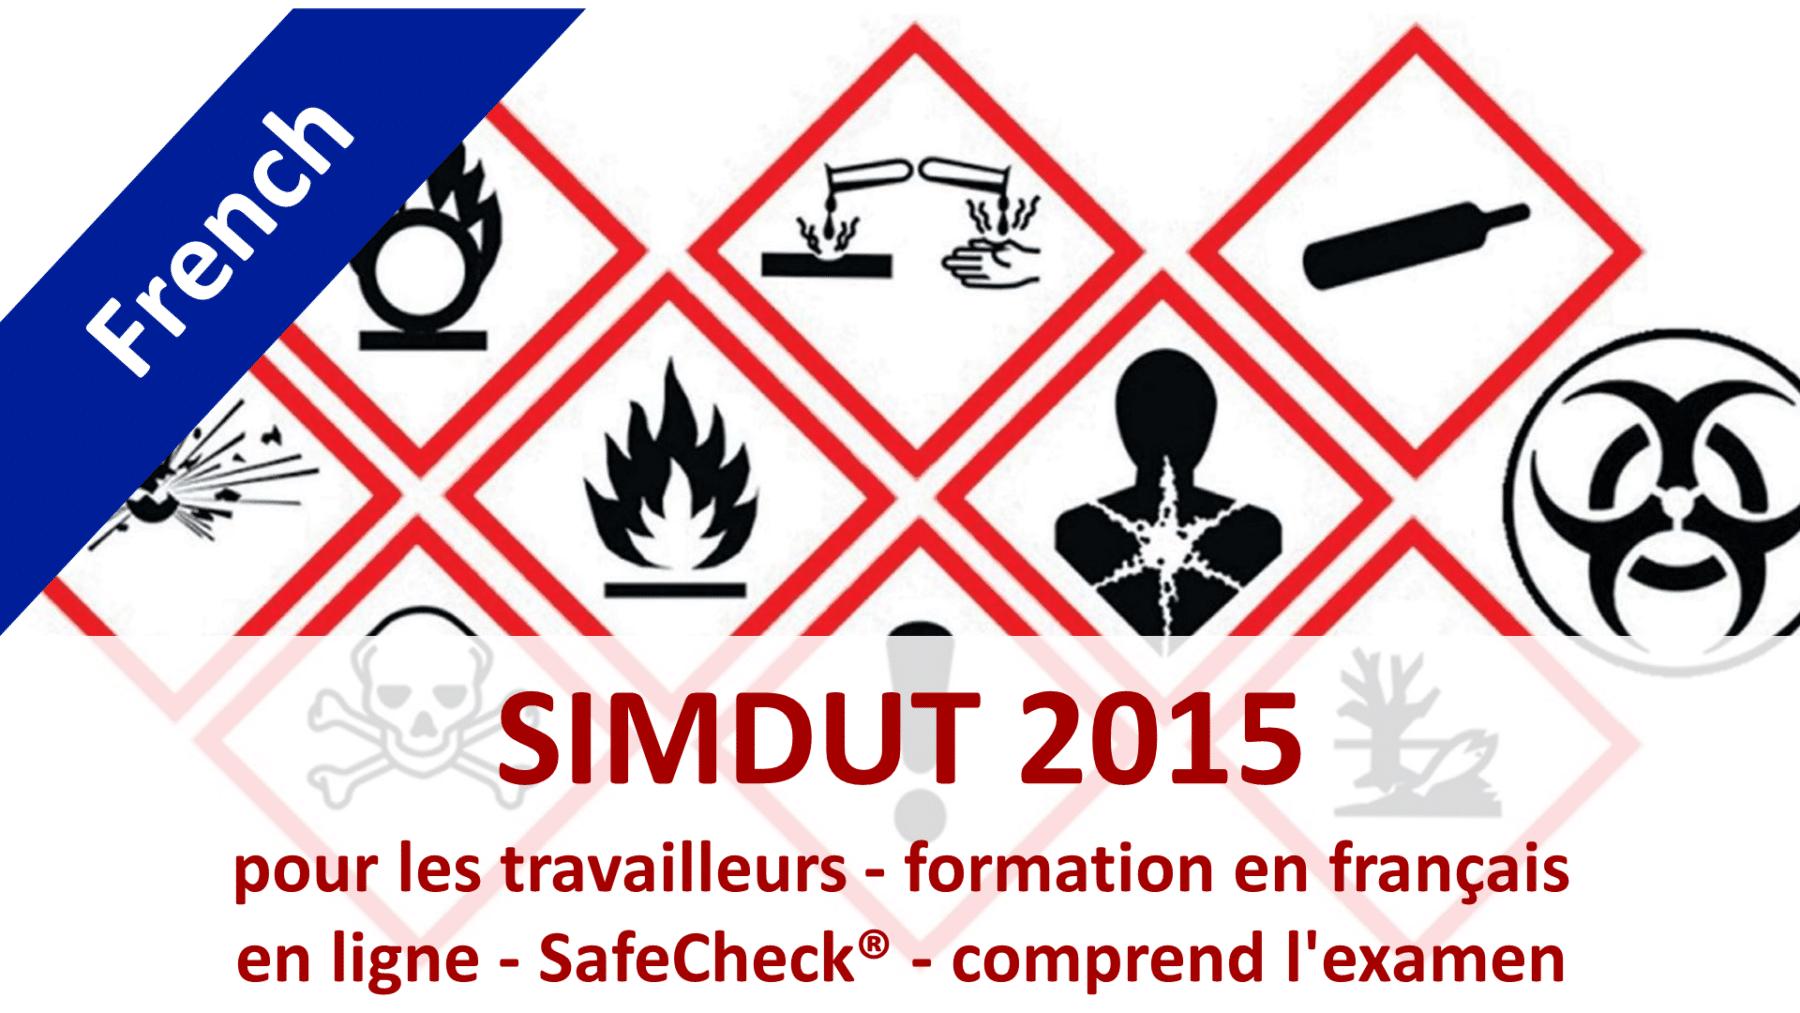 SIMDUT - WHMIS French Language Course